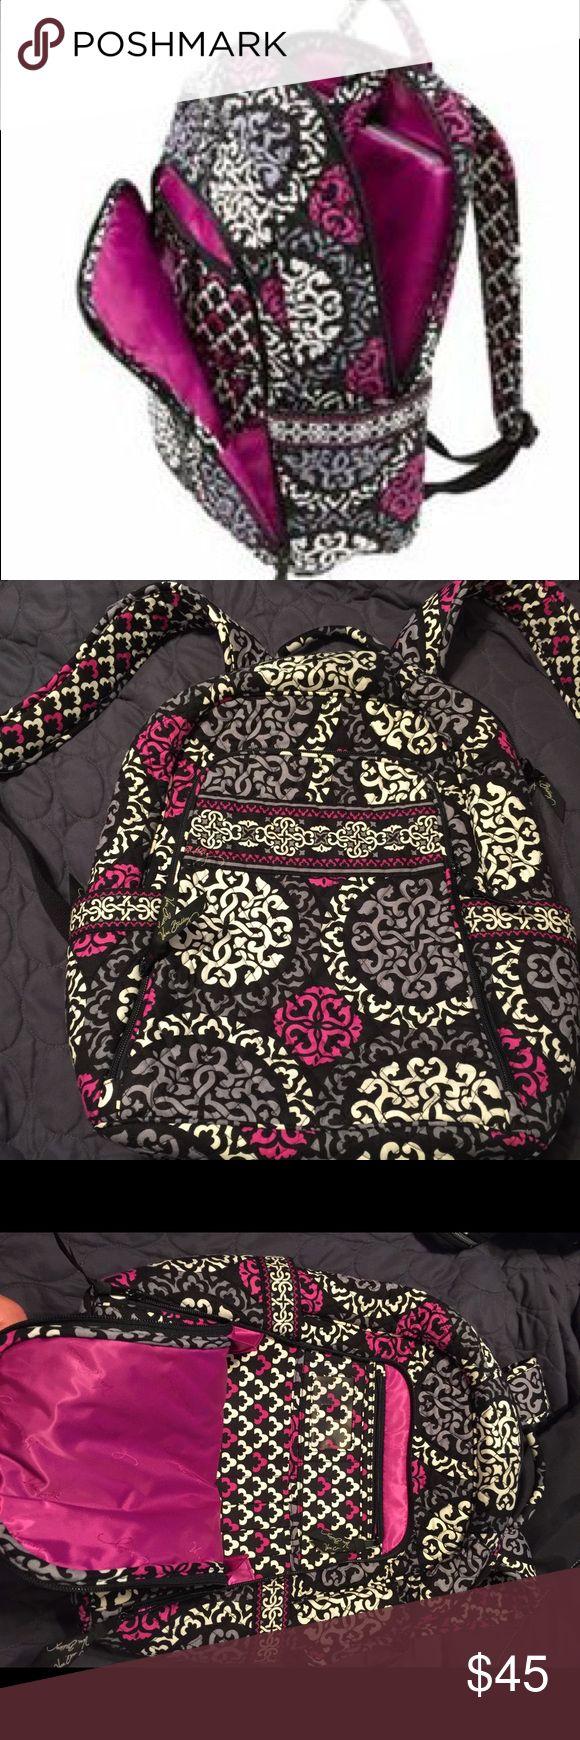 Vera Bradley Laptop backpack Canterbury Magenta Gently used laptop backpack by Vera Bradley, front pocket for holding cards, IDs, keys, and pens. 2 side pockets, adjustable straps. Vera Bradley Bags Laptop Bags